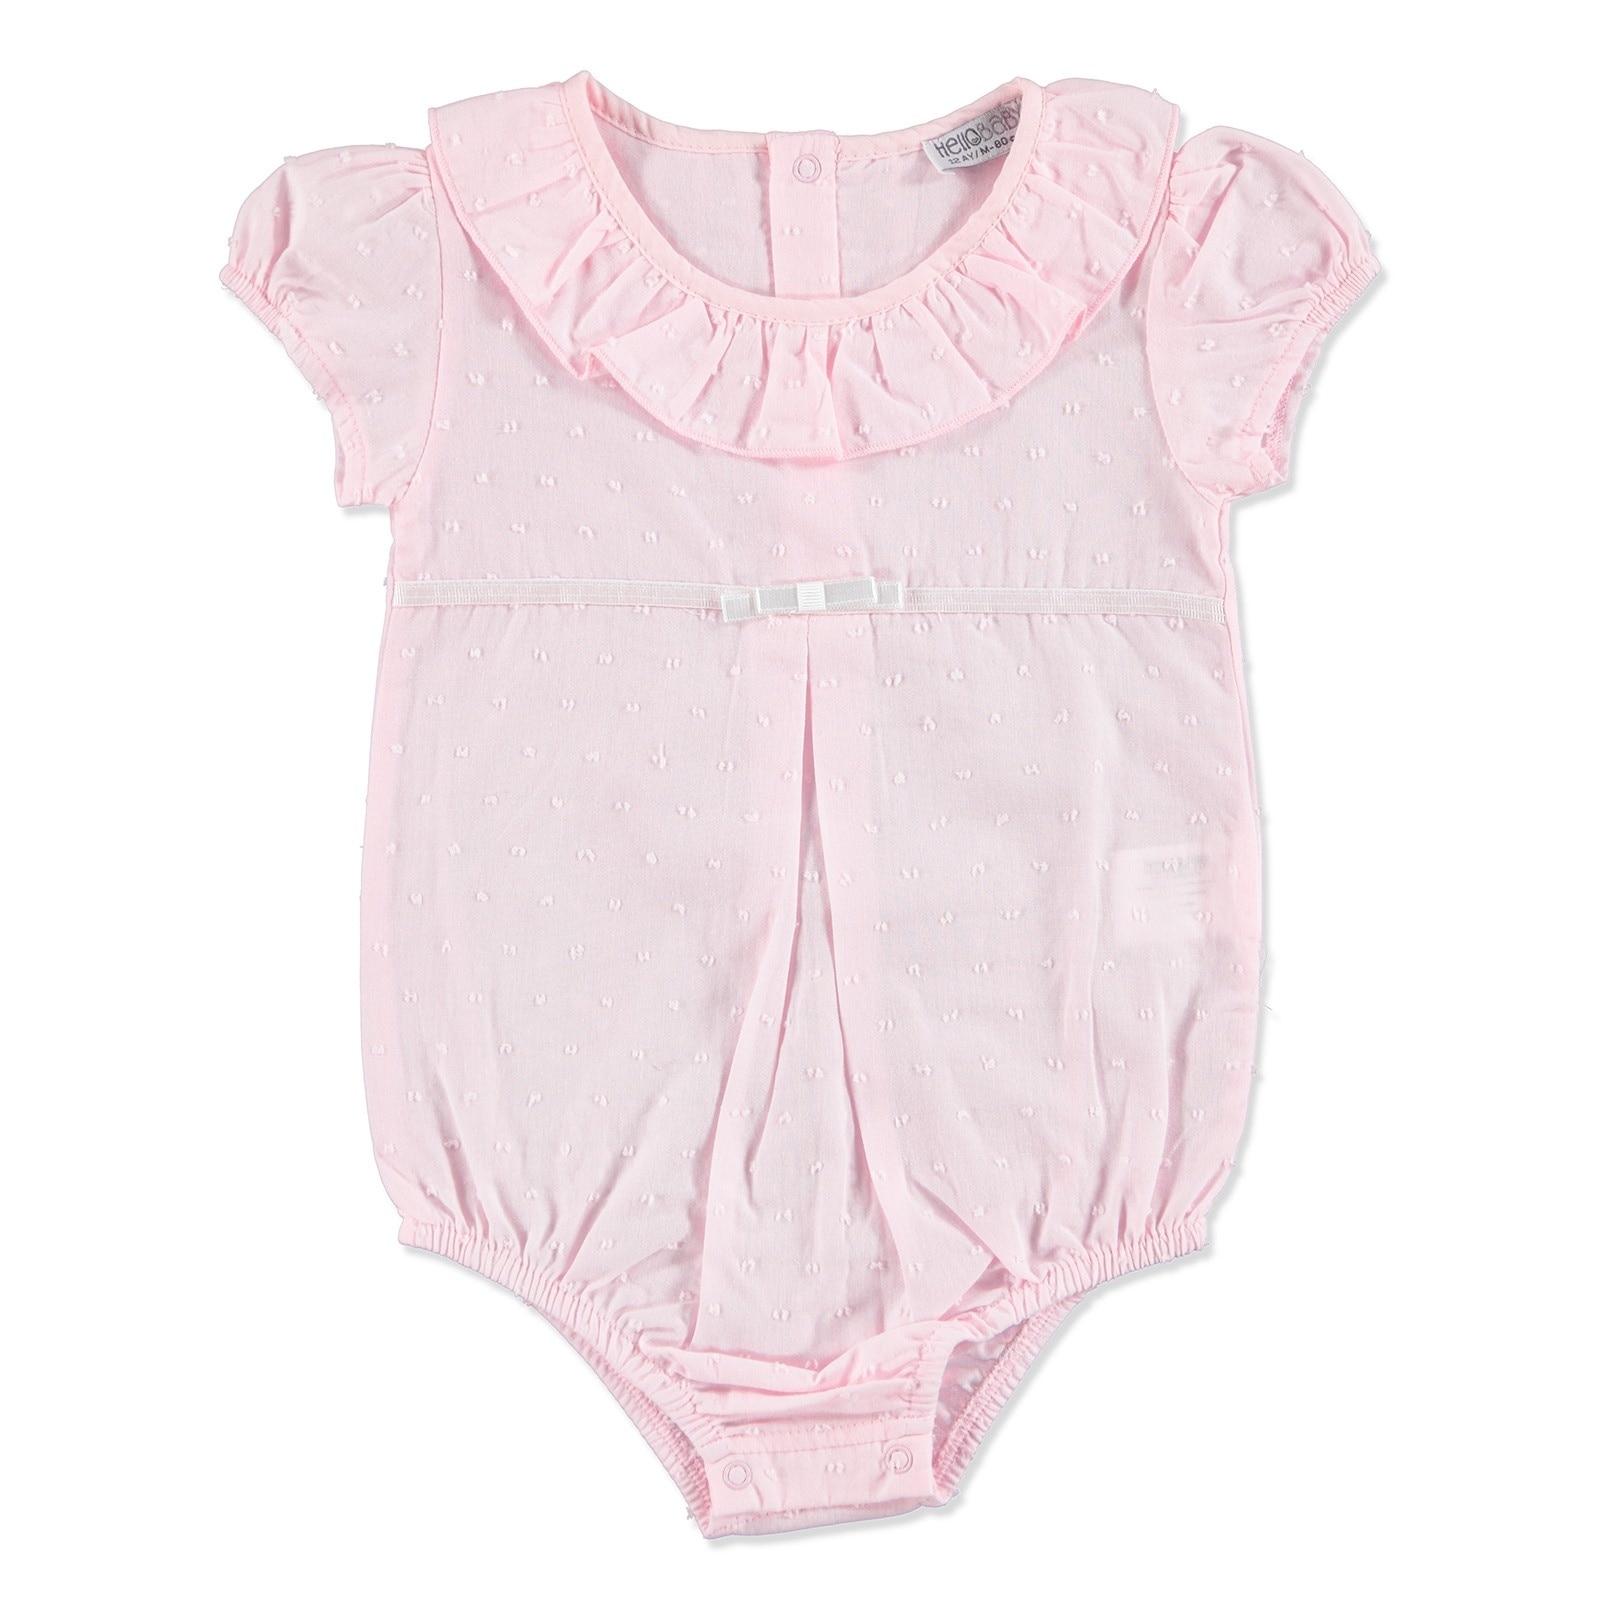 Ebebek HelloBaby Summer Baby The Cutiest Patterned Ruffled Neck Bodysuit